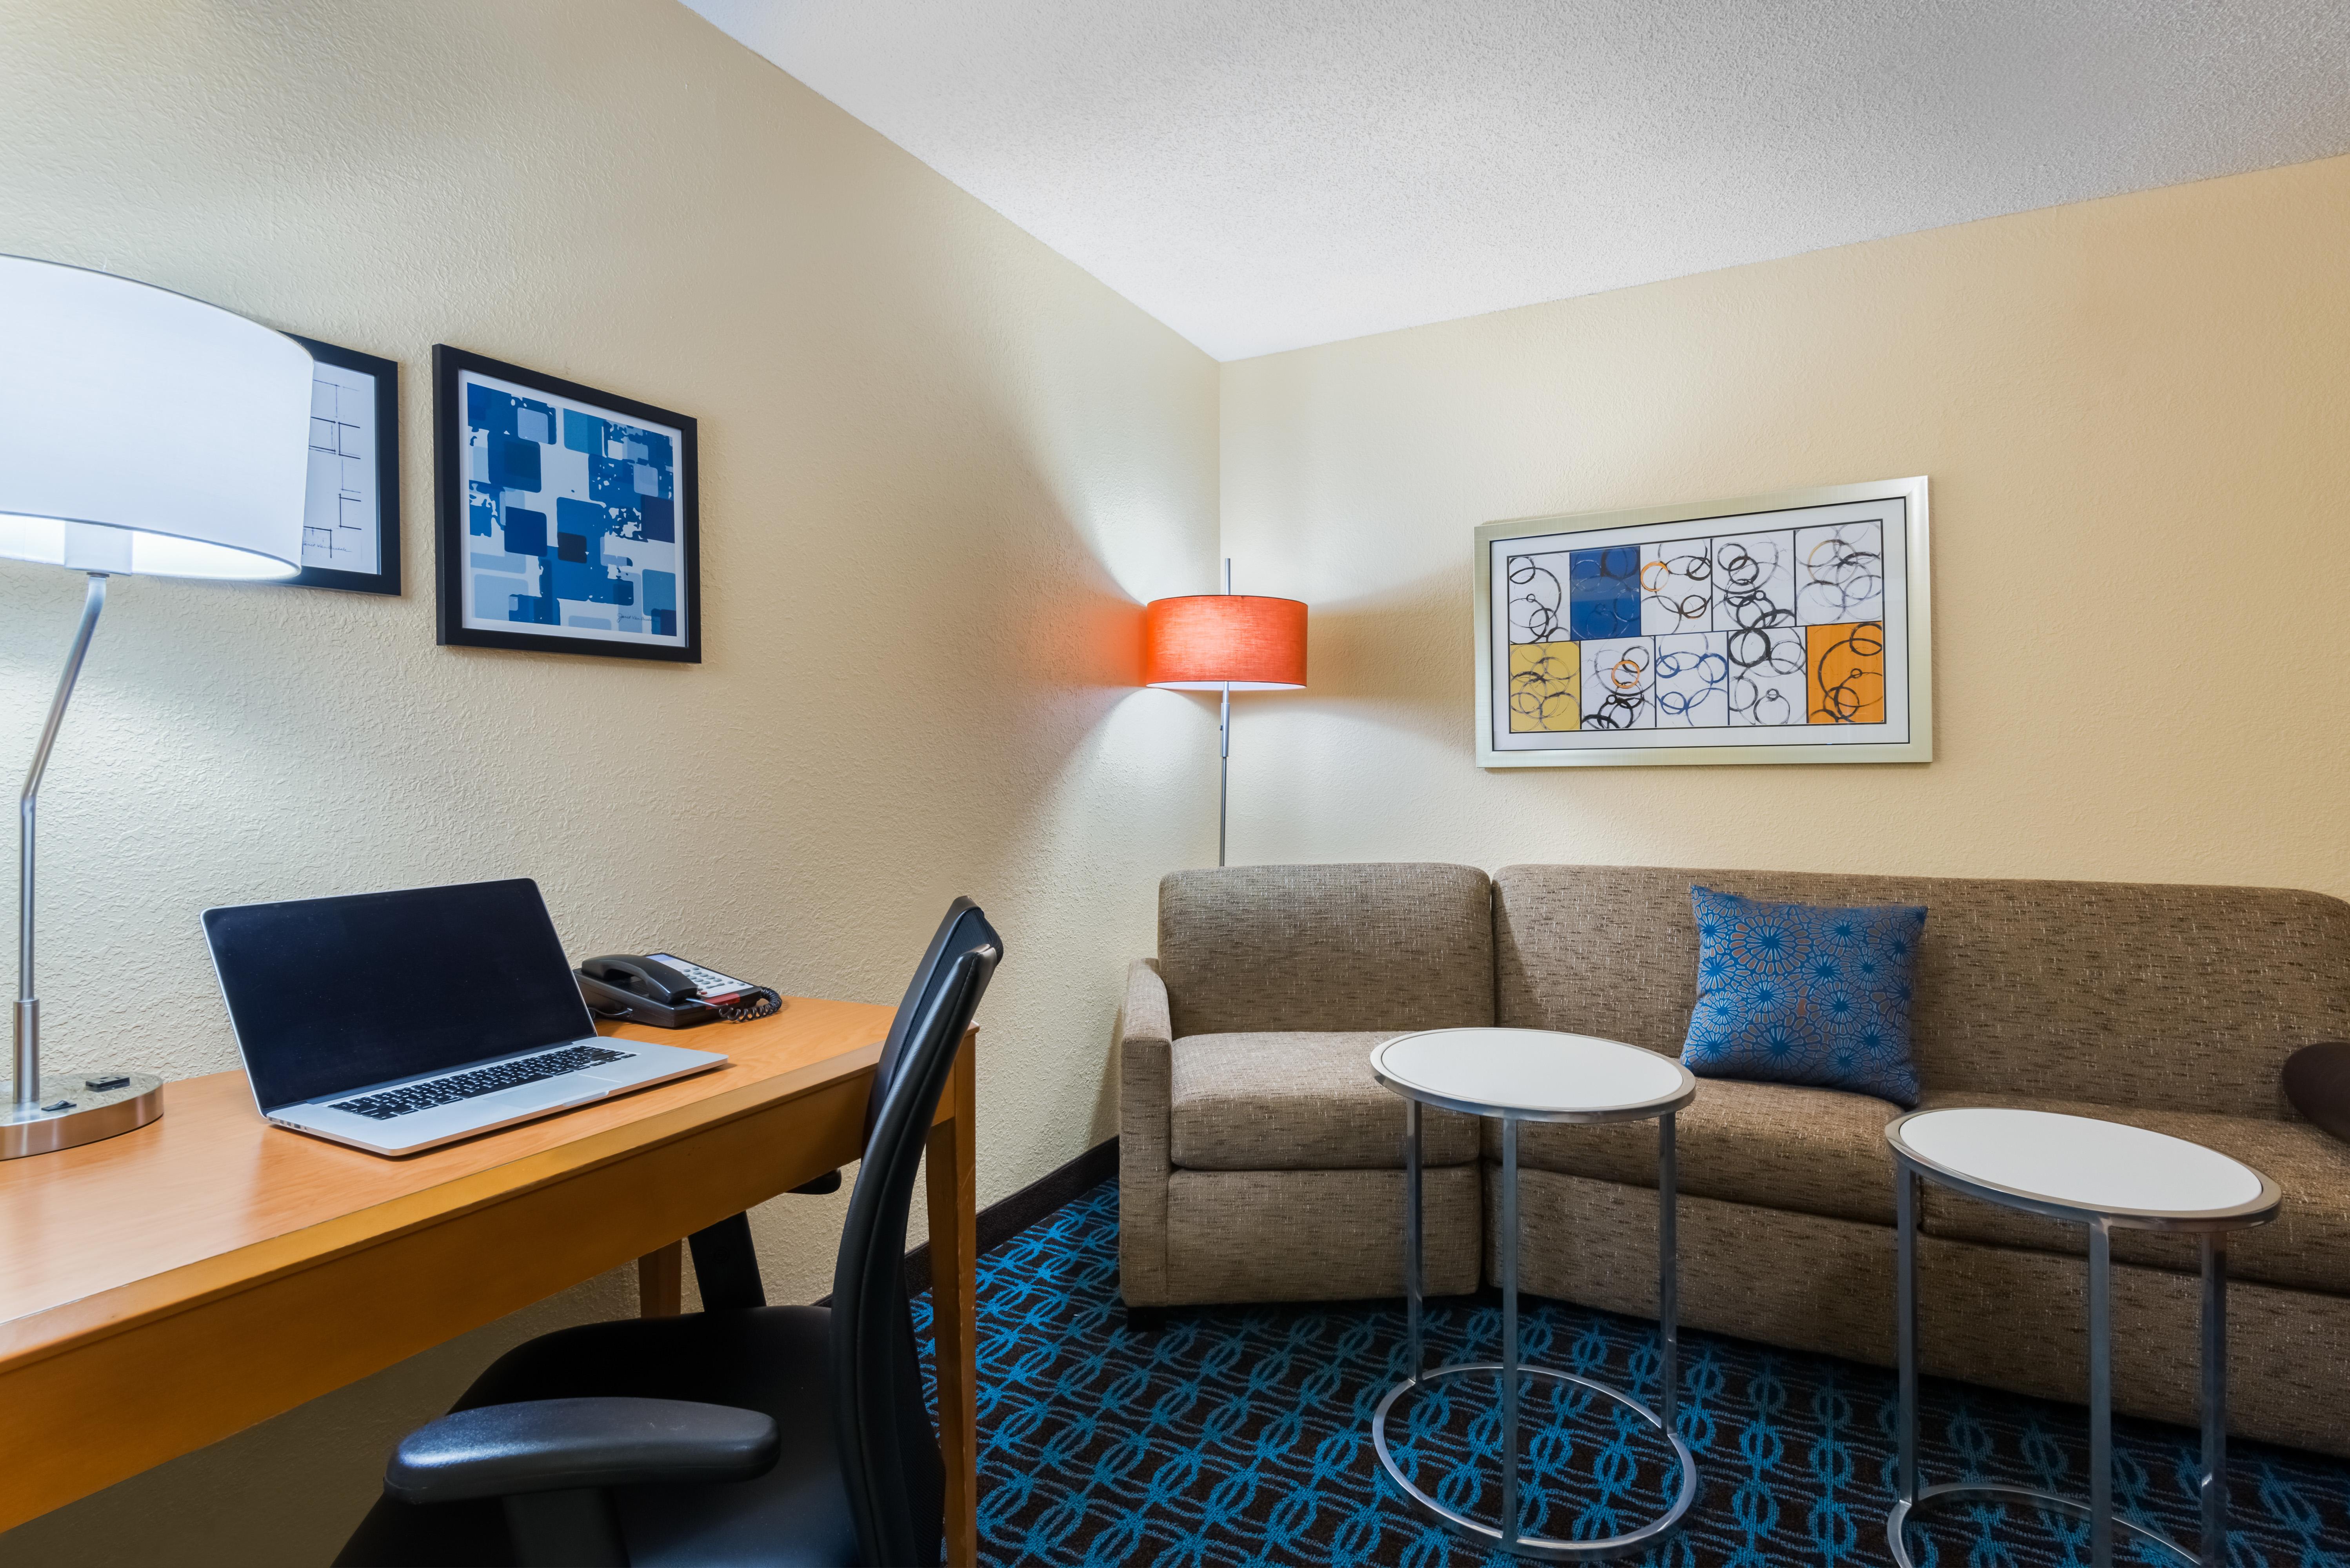 Fairfield Inn & Suites by Marriott Mobile image 7